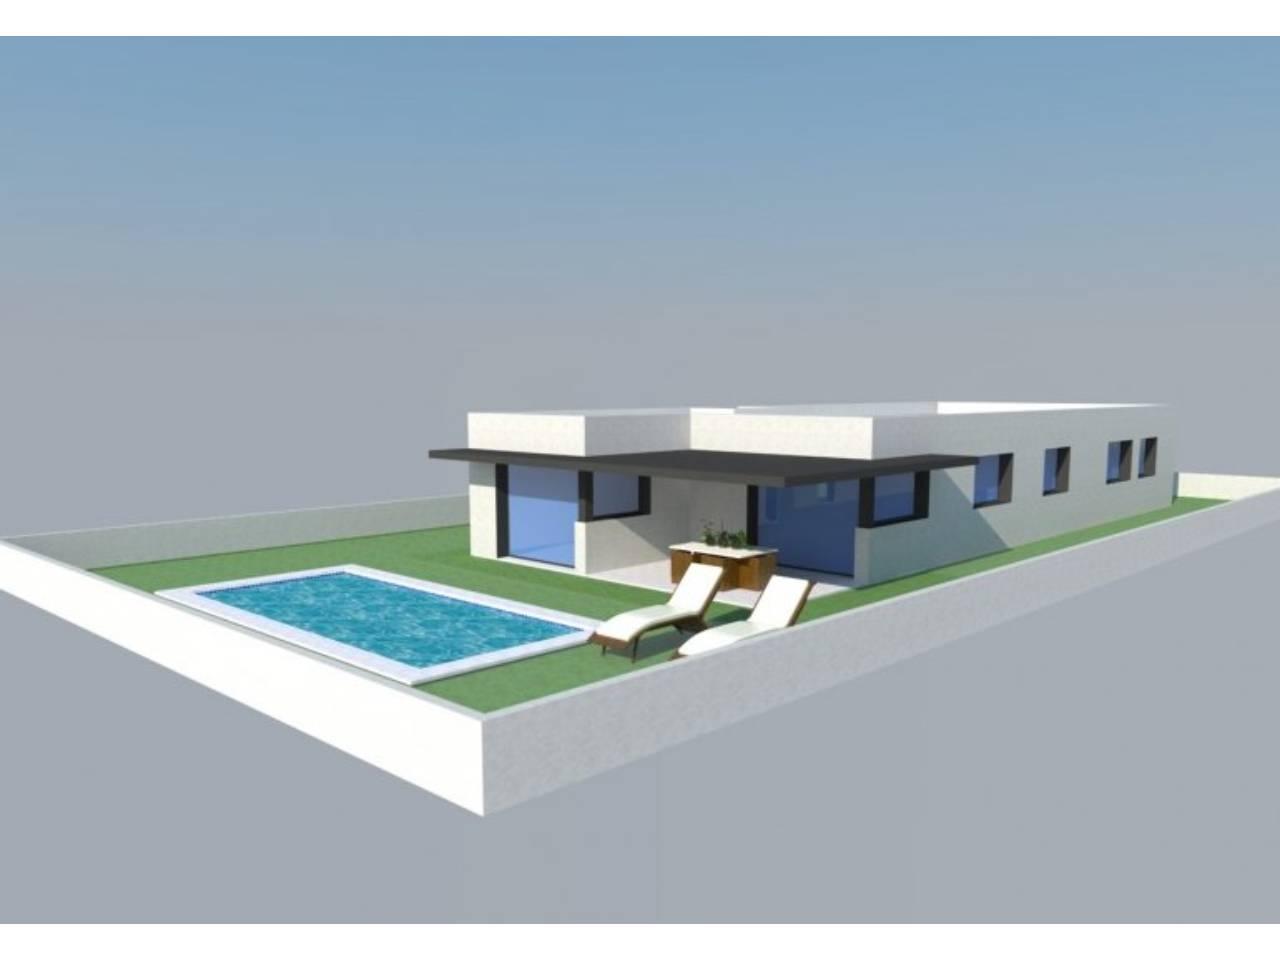 060146 - ROSES - LA GARRIGA Modelo casa COLERA